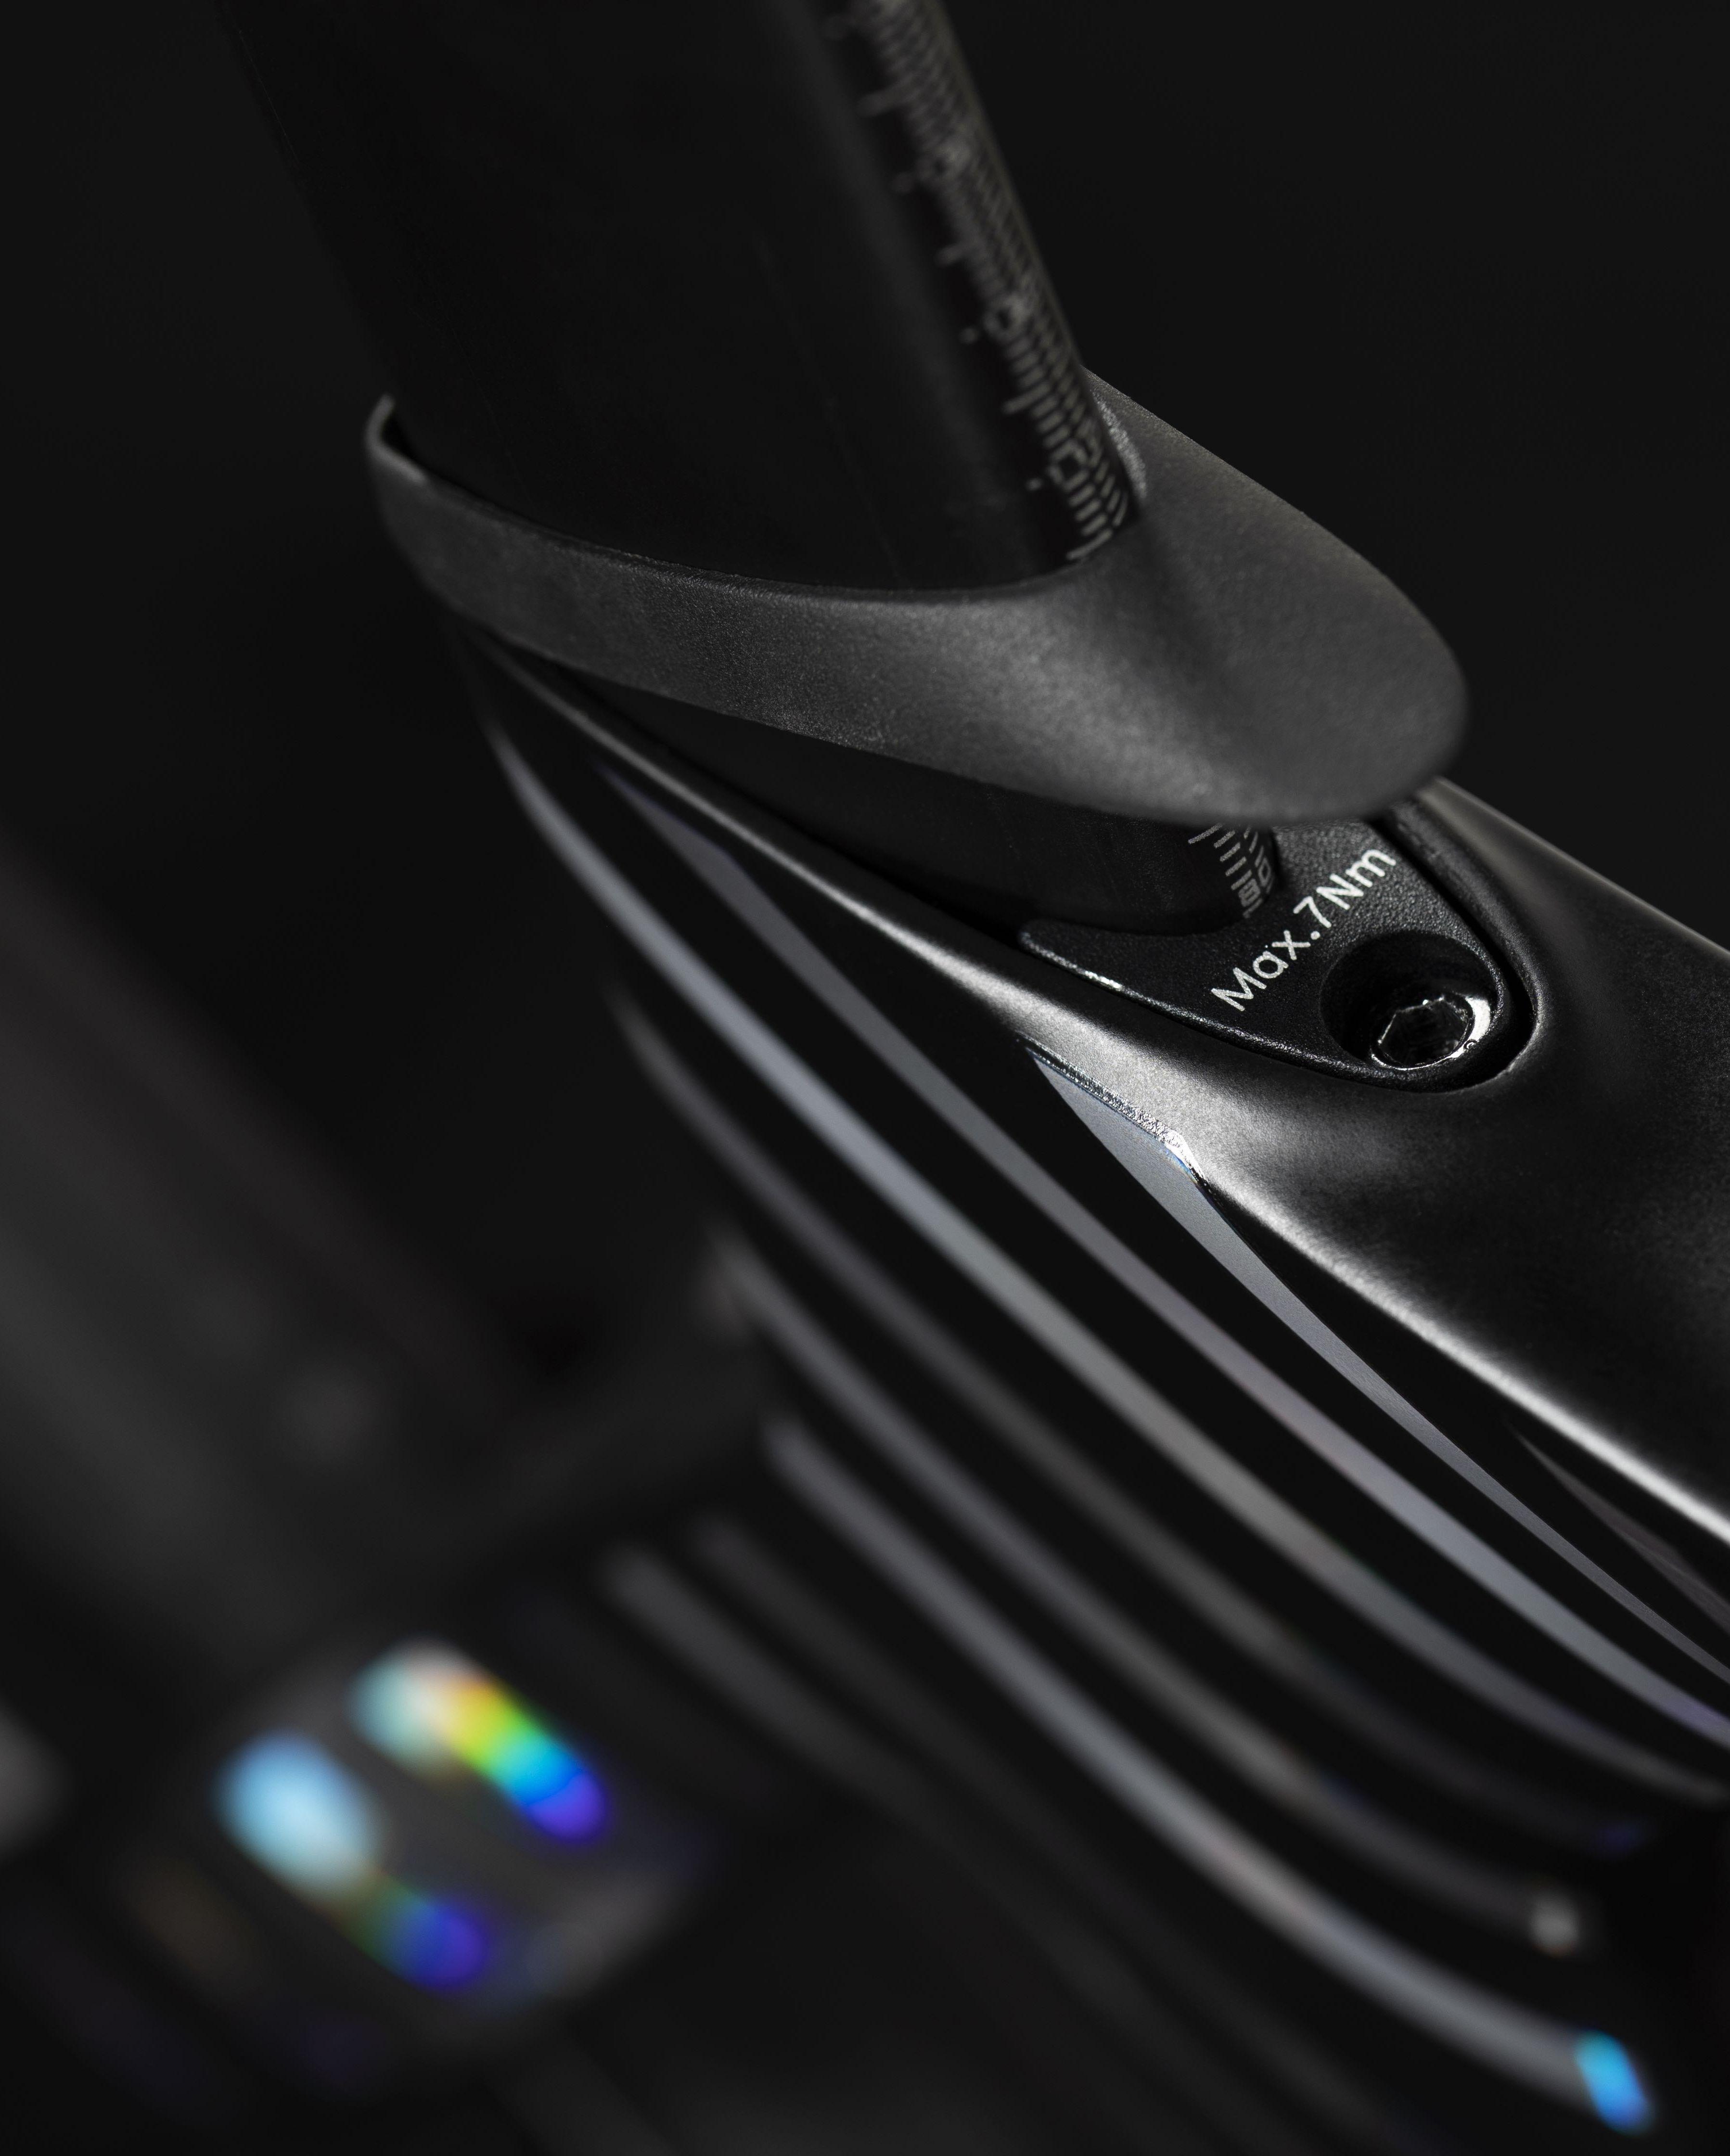 Liv EnviLiv seat clamp